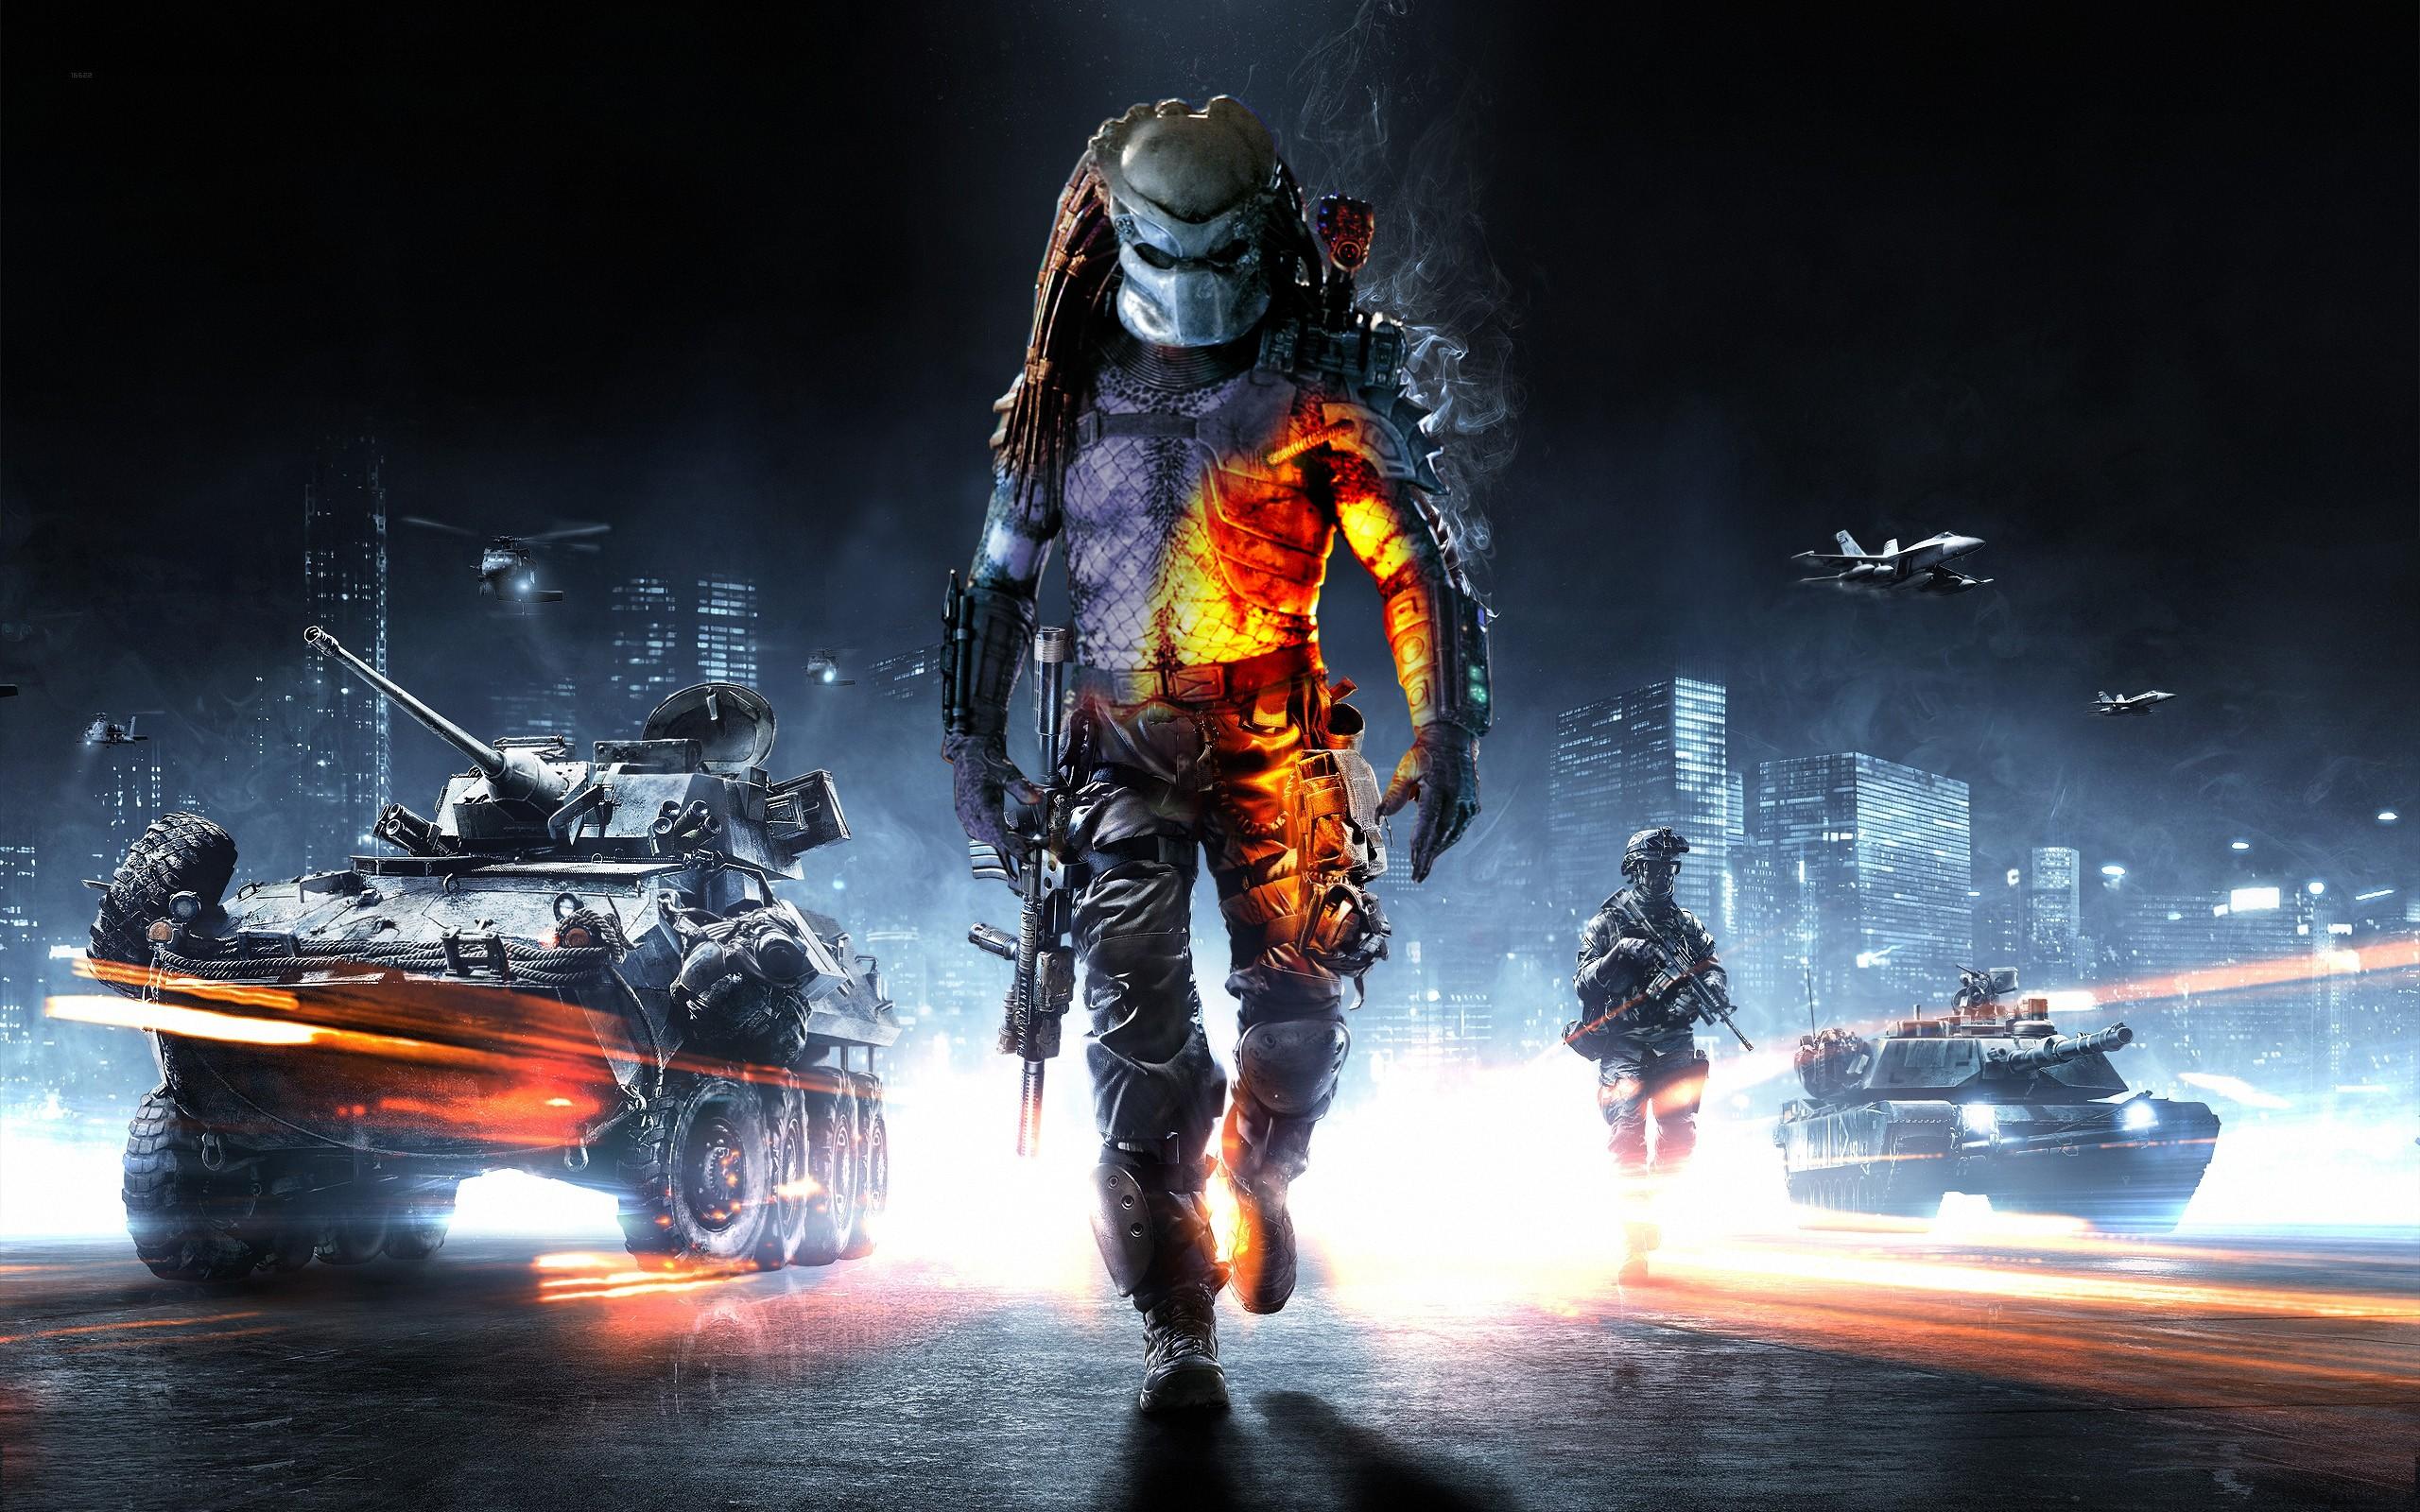 Predator Predators Battlefield 3 Madmark99 Wallpaper 2560x1600 16880 Wallpaperup